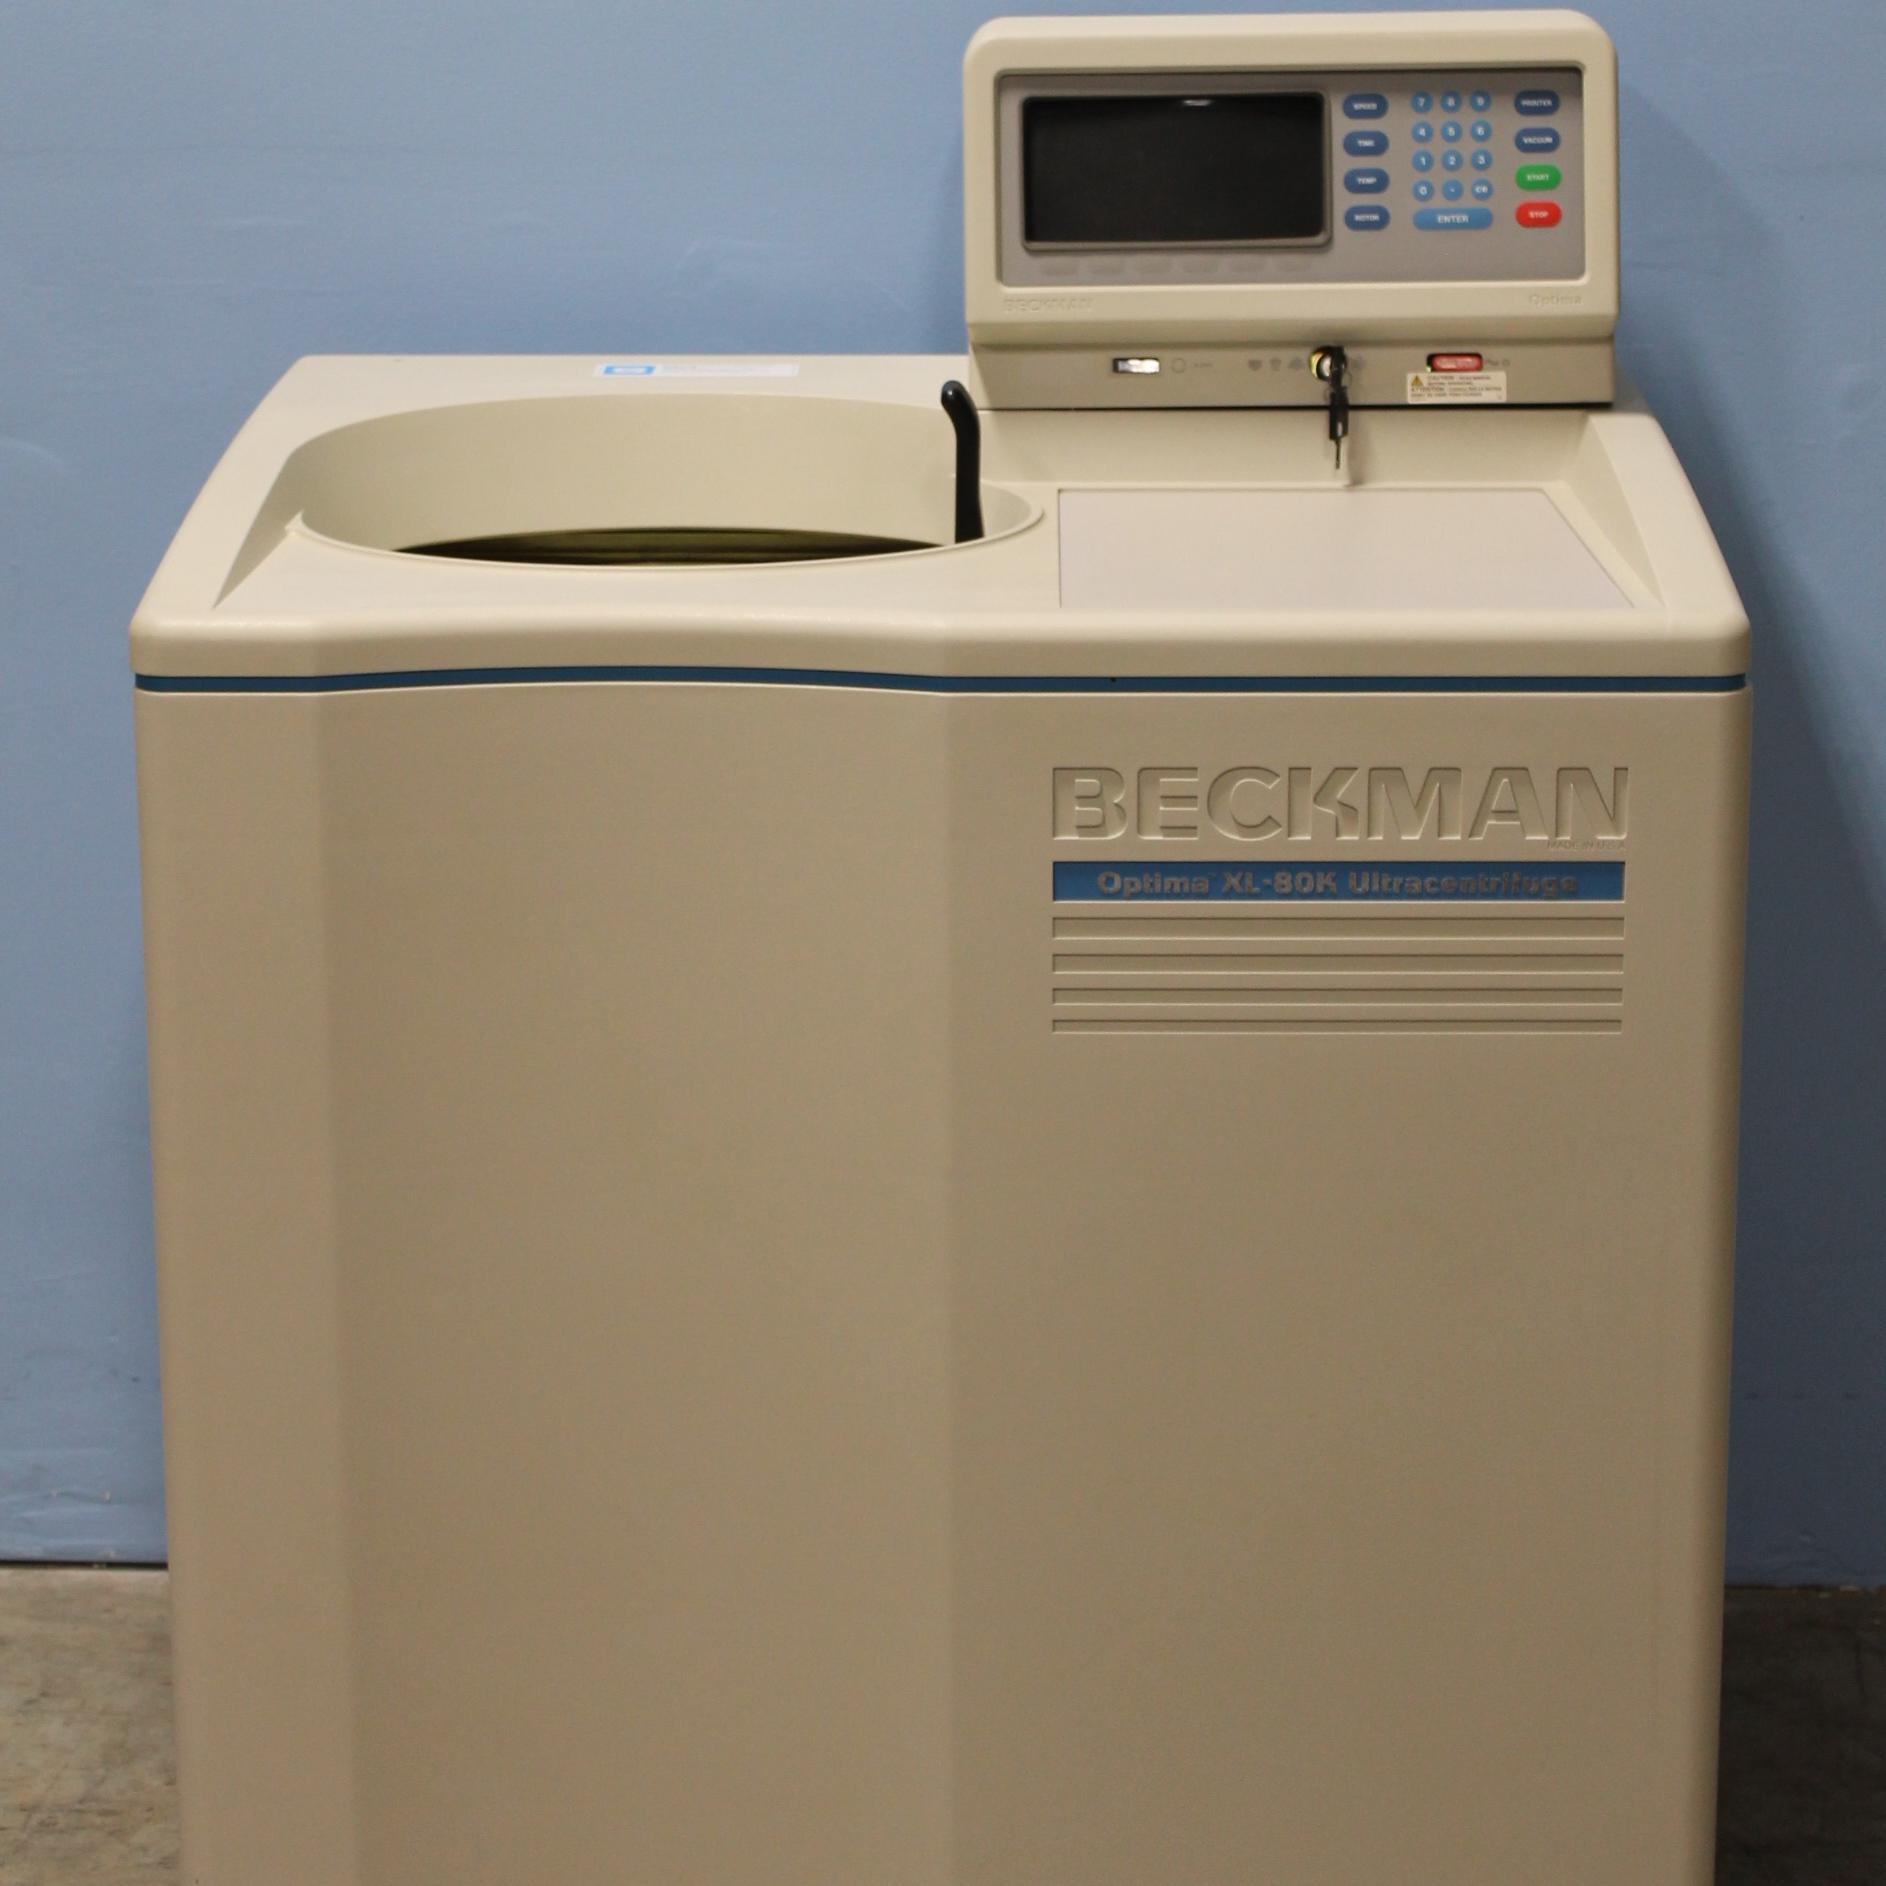 Beckman Optima XL-80K Ultra Centrifuge Image